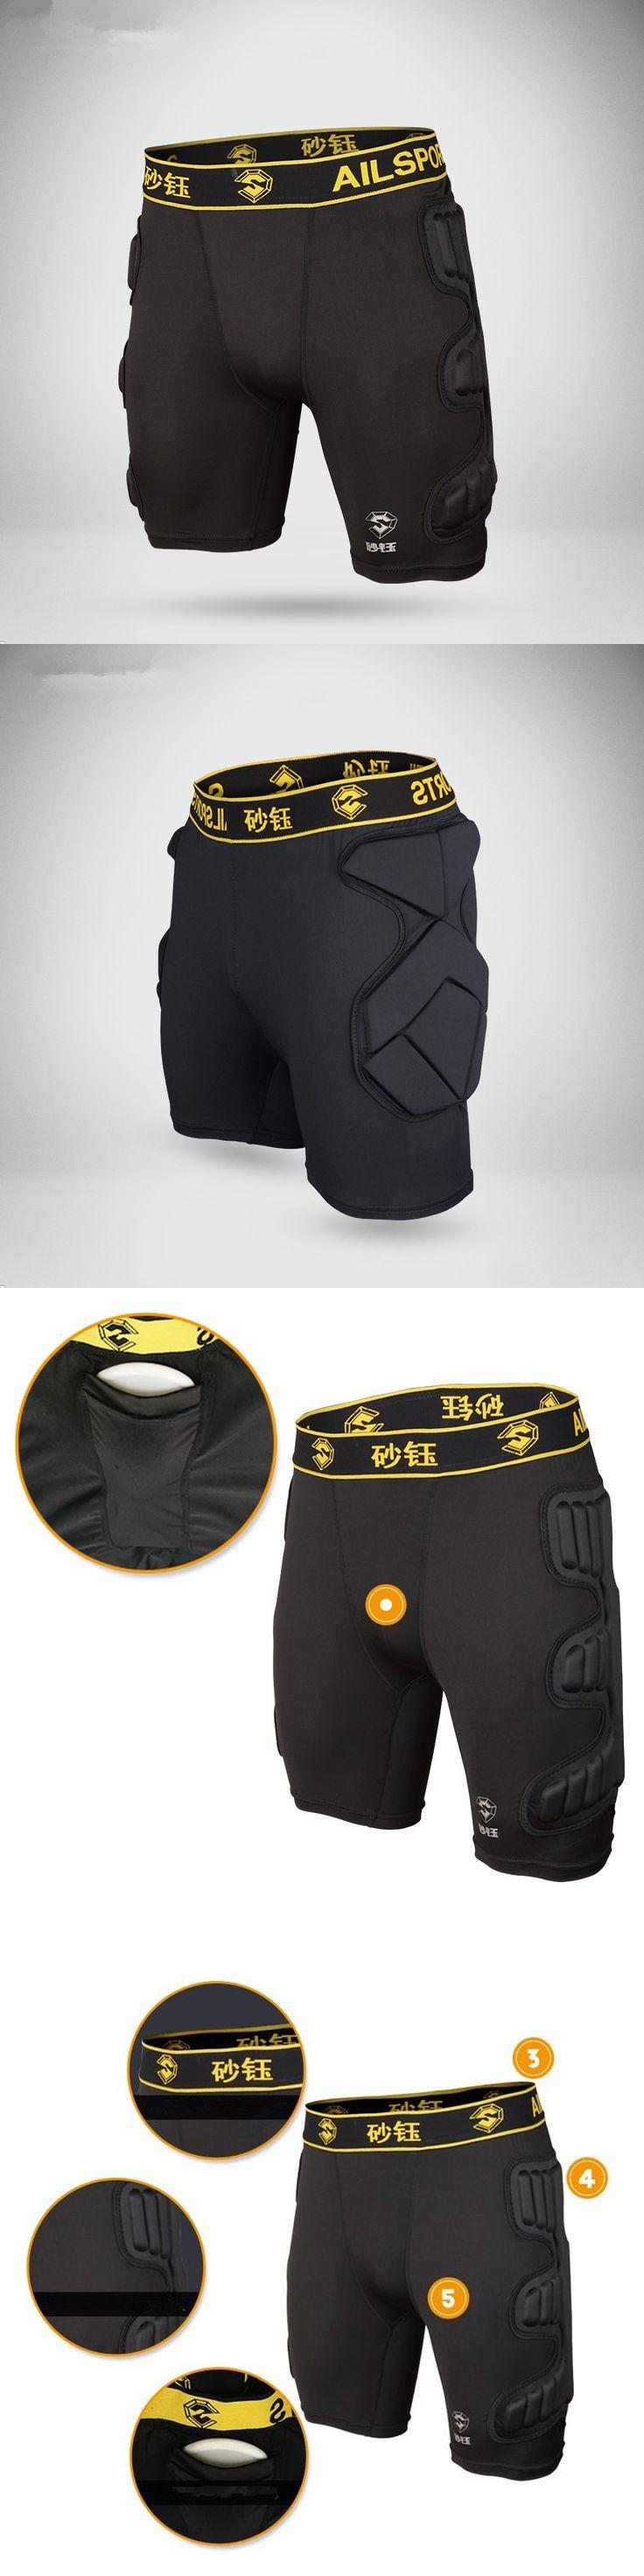 2017 Football Goalkeepers Shorts Men Soccer Running Training Shorts Futbol Protection Sponge Roller Skating Shorts Crash Tackles